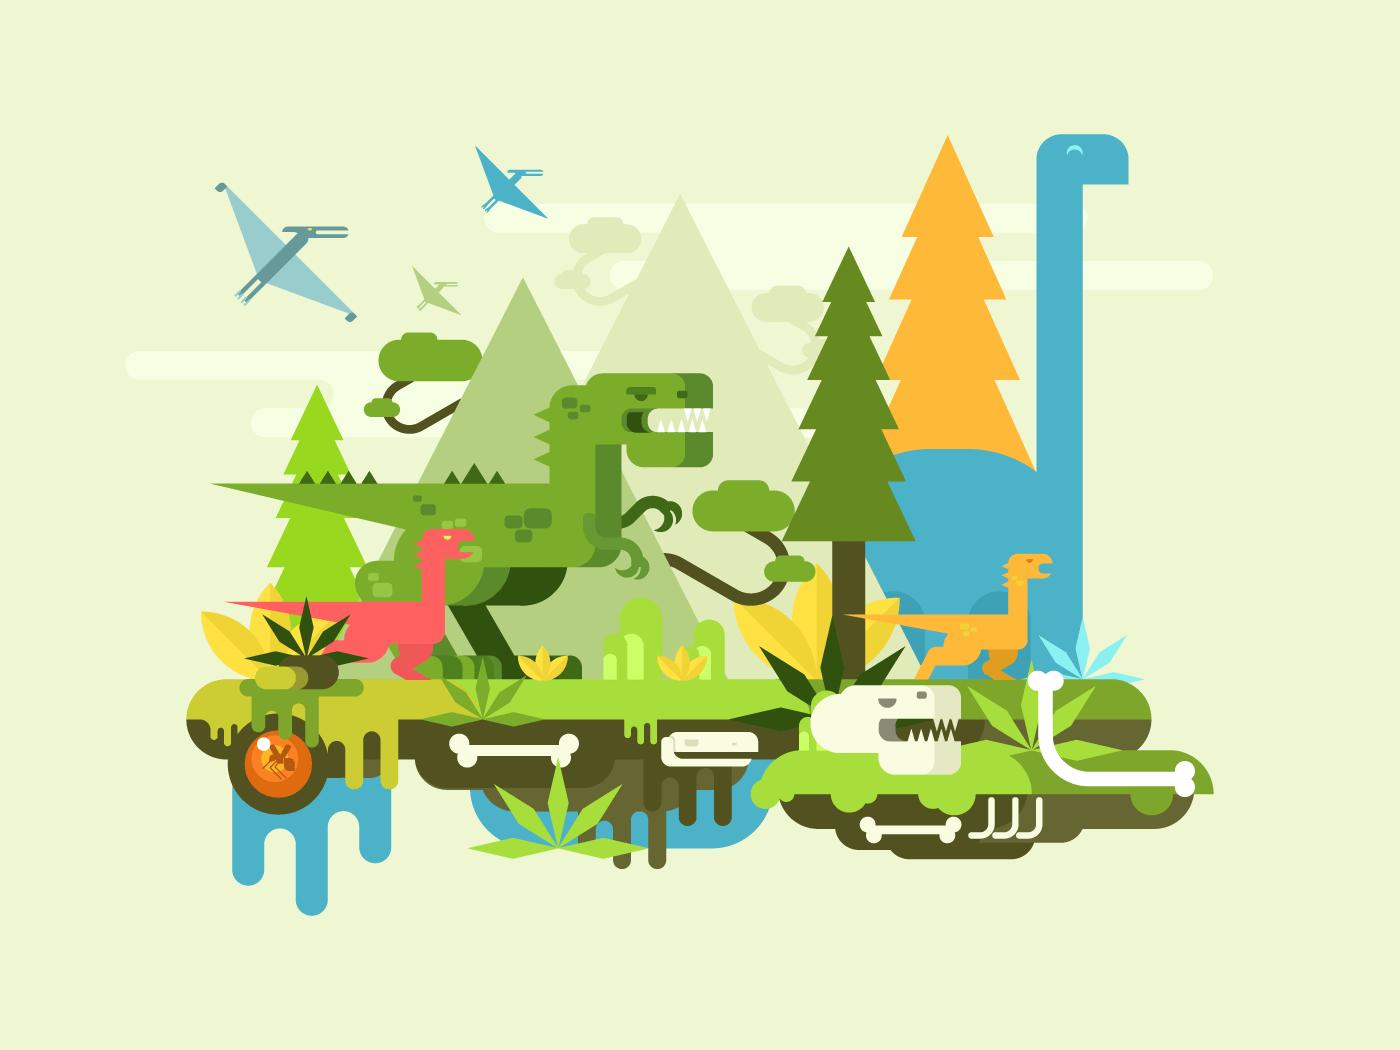 Dawn of the dinosaurs flat vector illustration